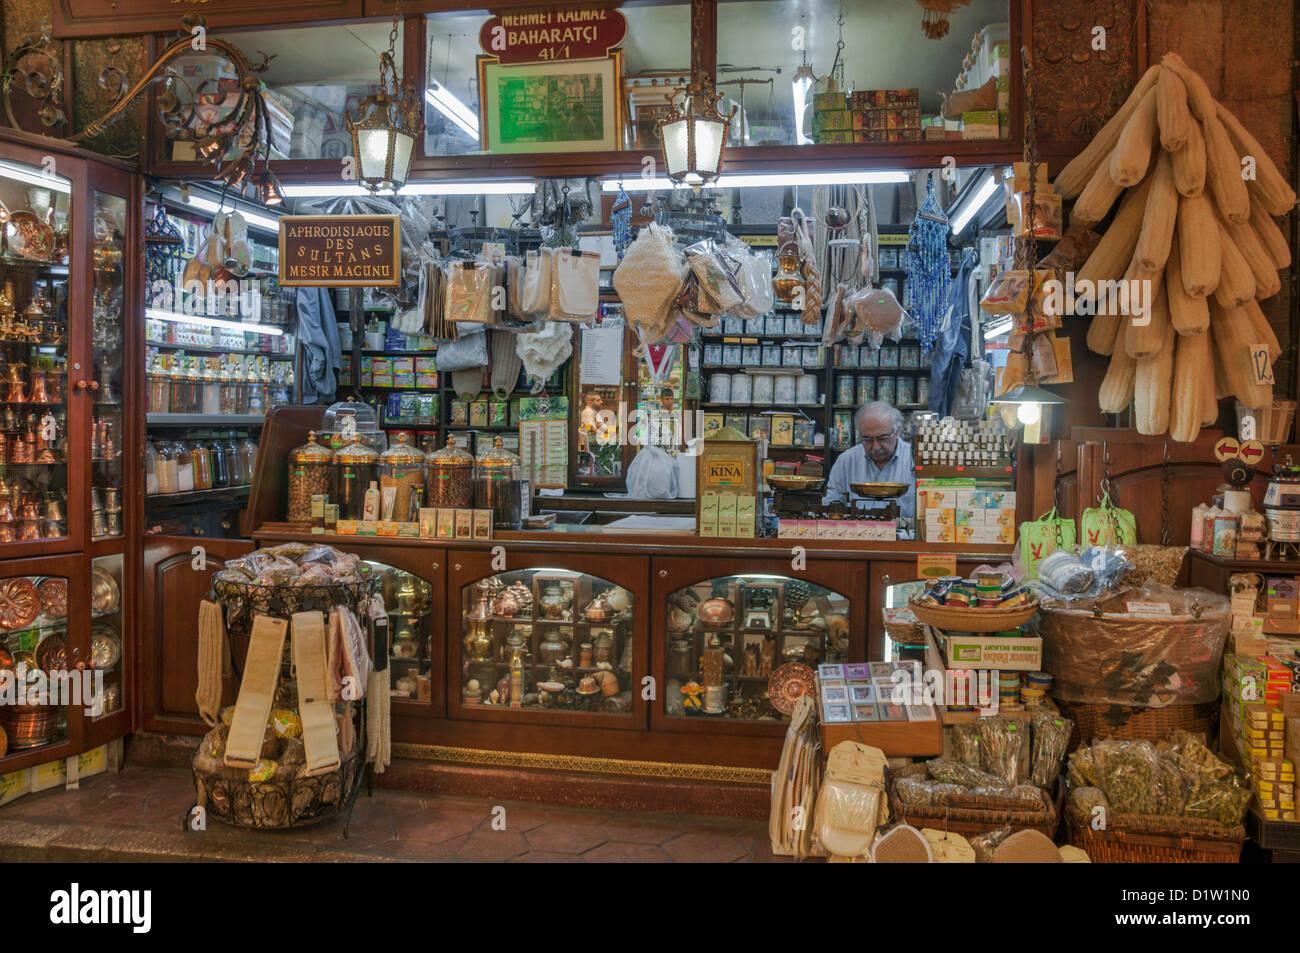 Herbalist shop in spice bazaar(Egyptian Bazaar) of Eminonu,istanbul,Turkey - Stock Image